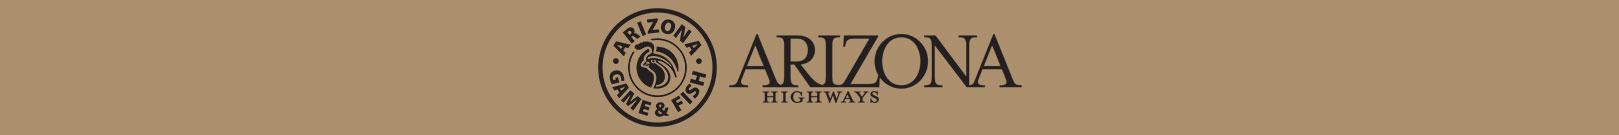 Arizona Game & Fish and Arizona Highways Sponsor Logos